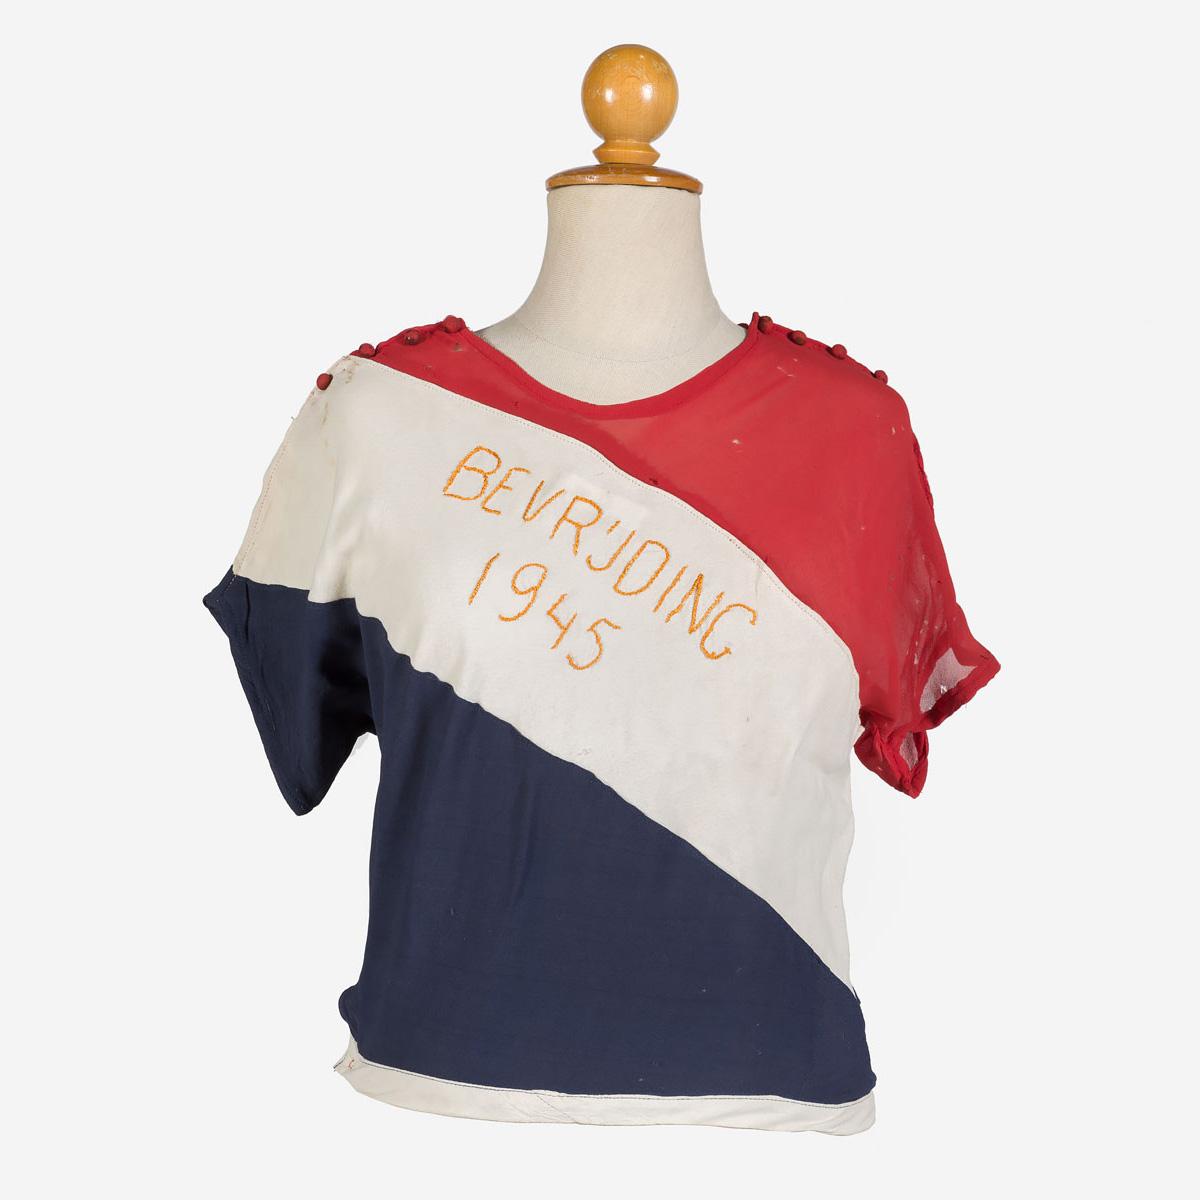 Bevrijdingsbloes - Vrijheidsmuseum Groesbeek